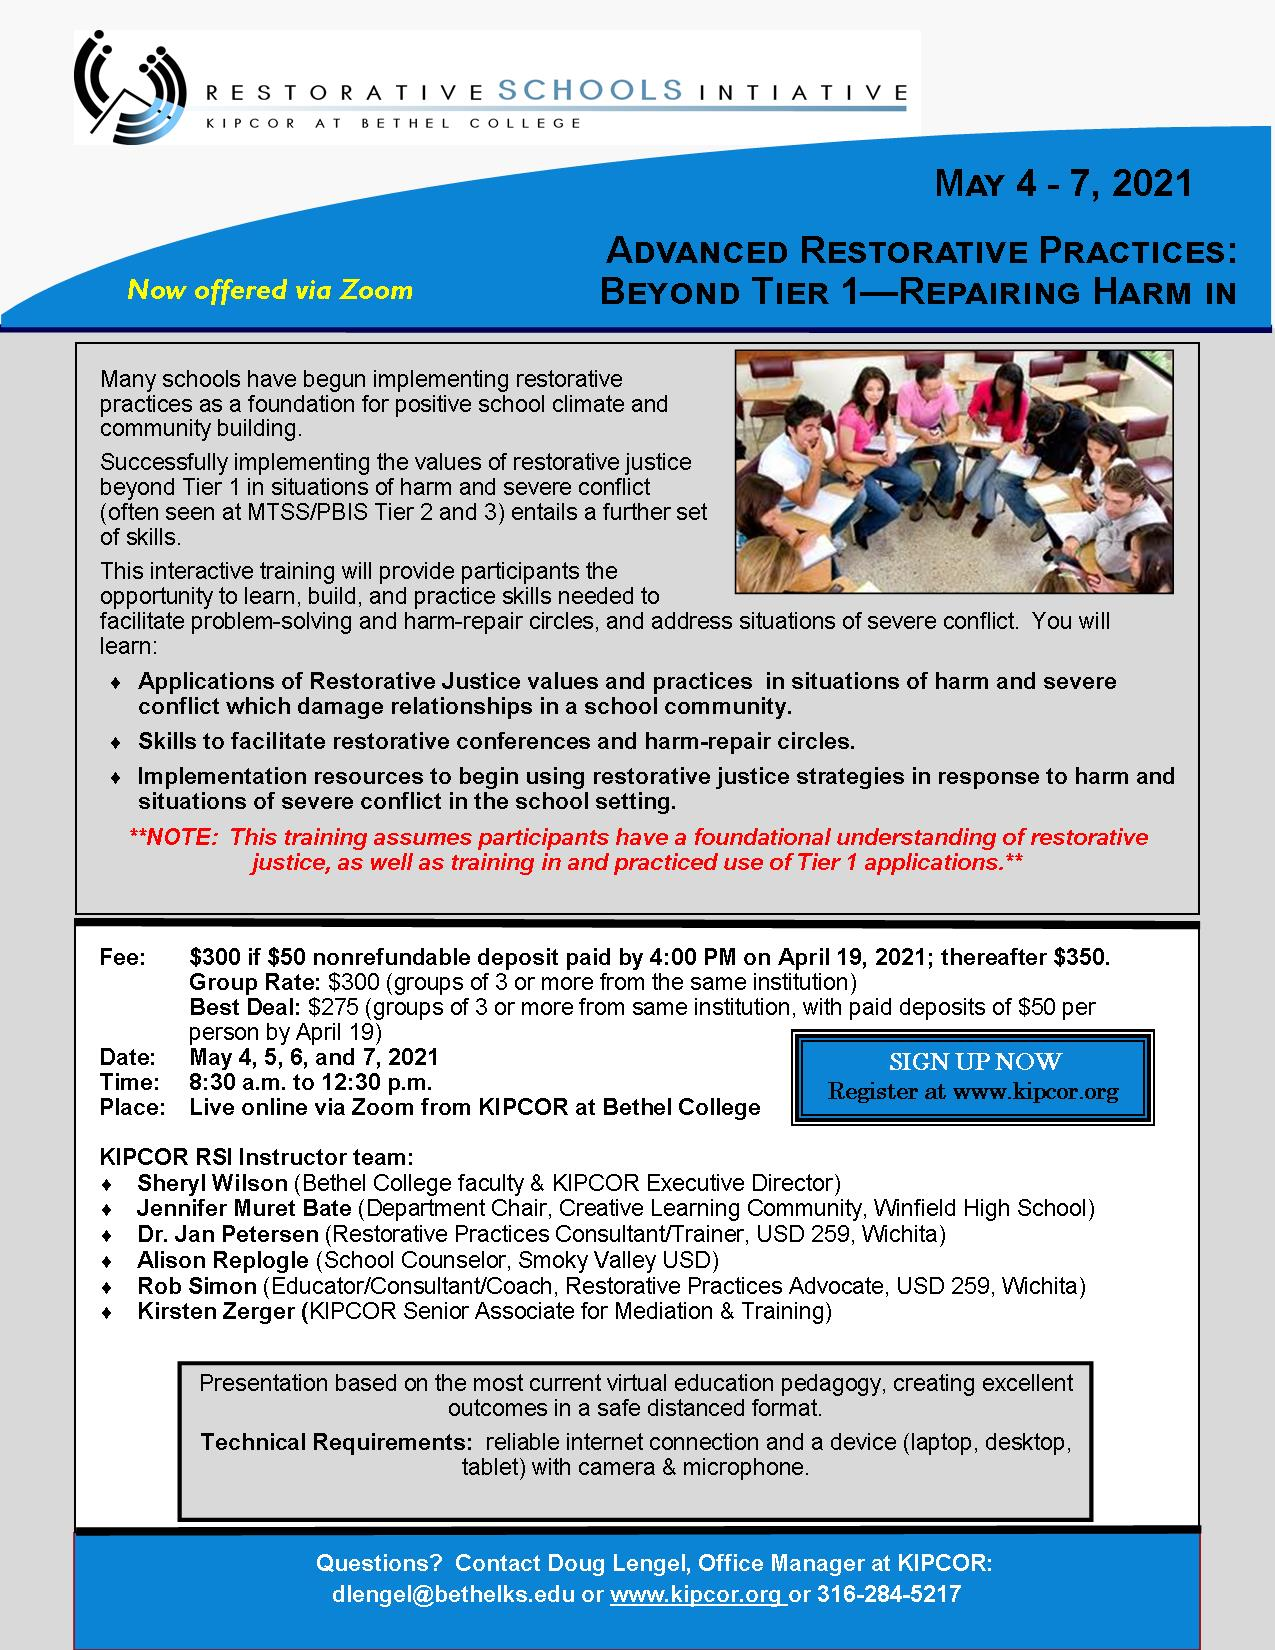 Advanced Restorative Schools Training:  Repairing Harm  May 4-7, 2021  Offered Live Online, via Zoom